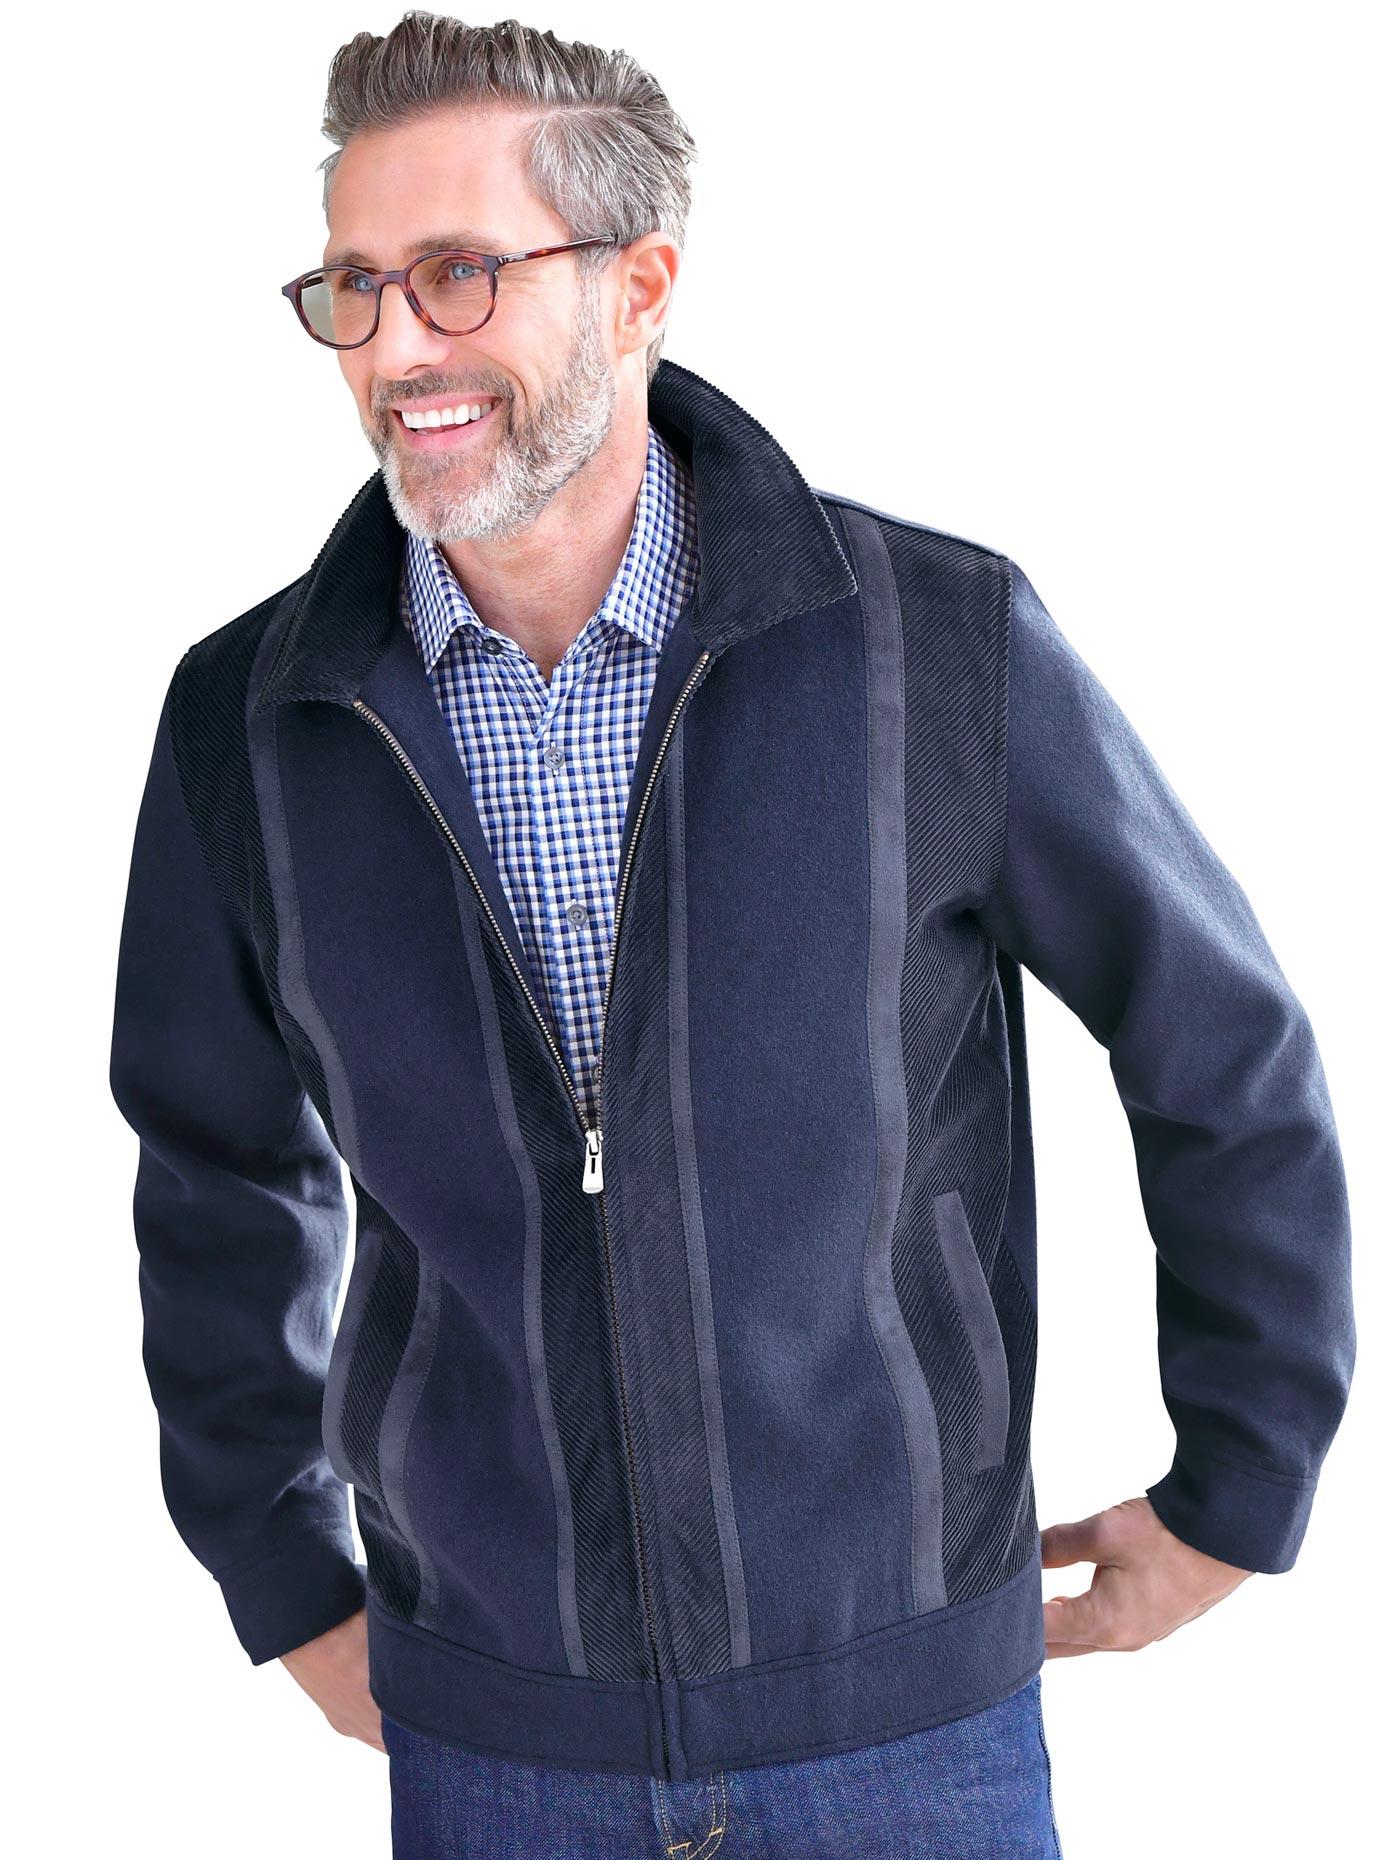 Marco Donati Blouson mit doppeltem Umlegekragen   Bekleidung > Jacken > Blousons   marco donati